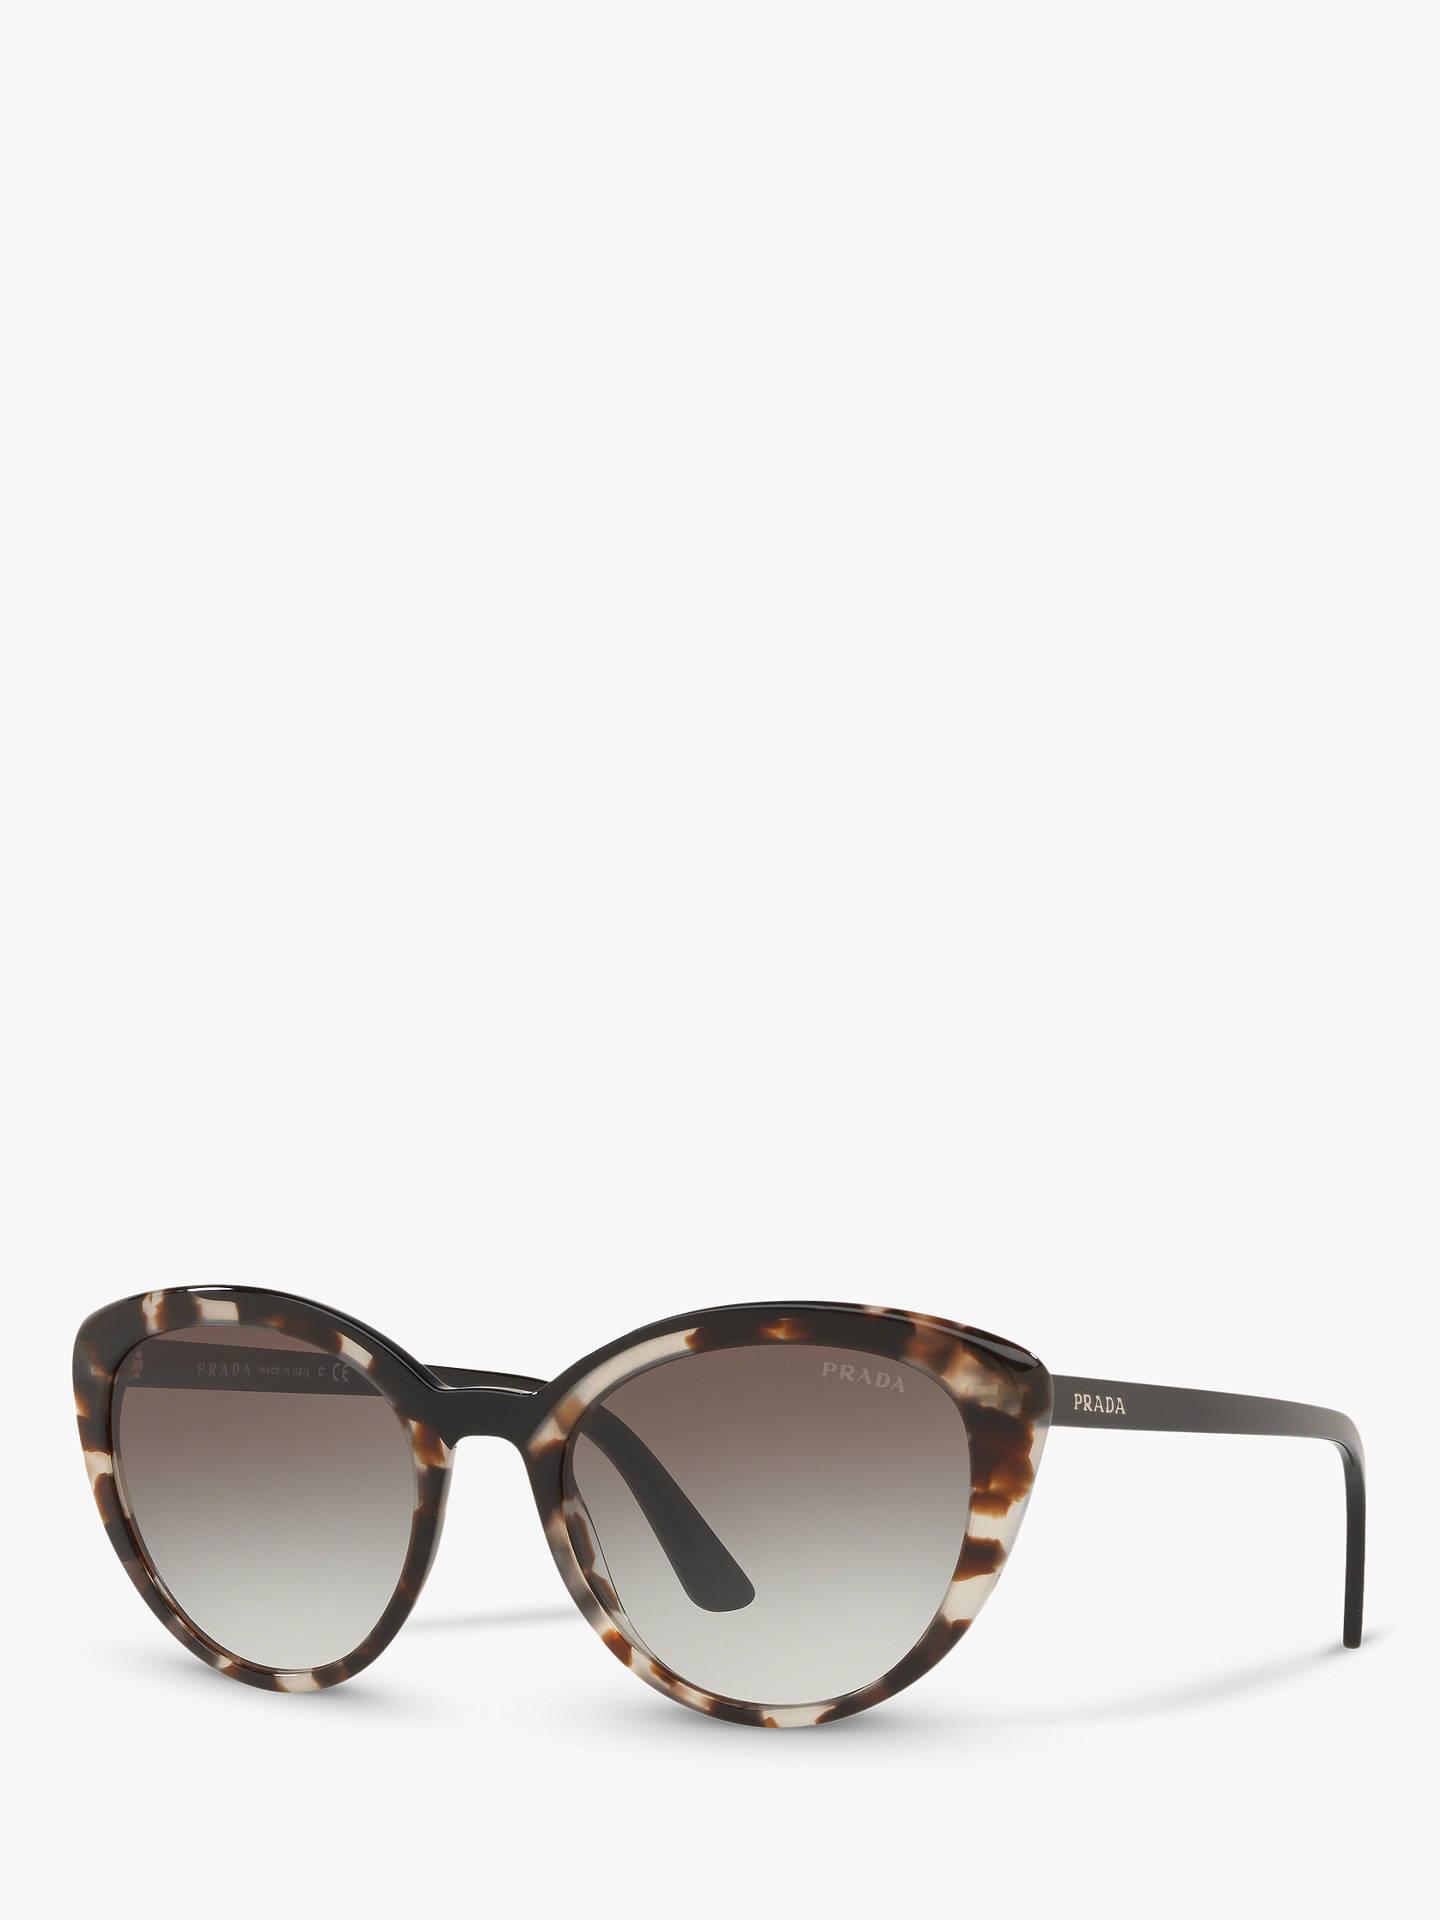 a7e3638ef4e1 Prada PR 02VS Women s Cat s Eye Sunglasses at John Lewis   Partners